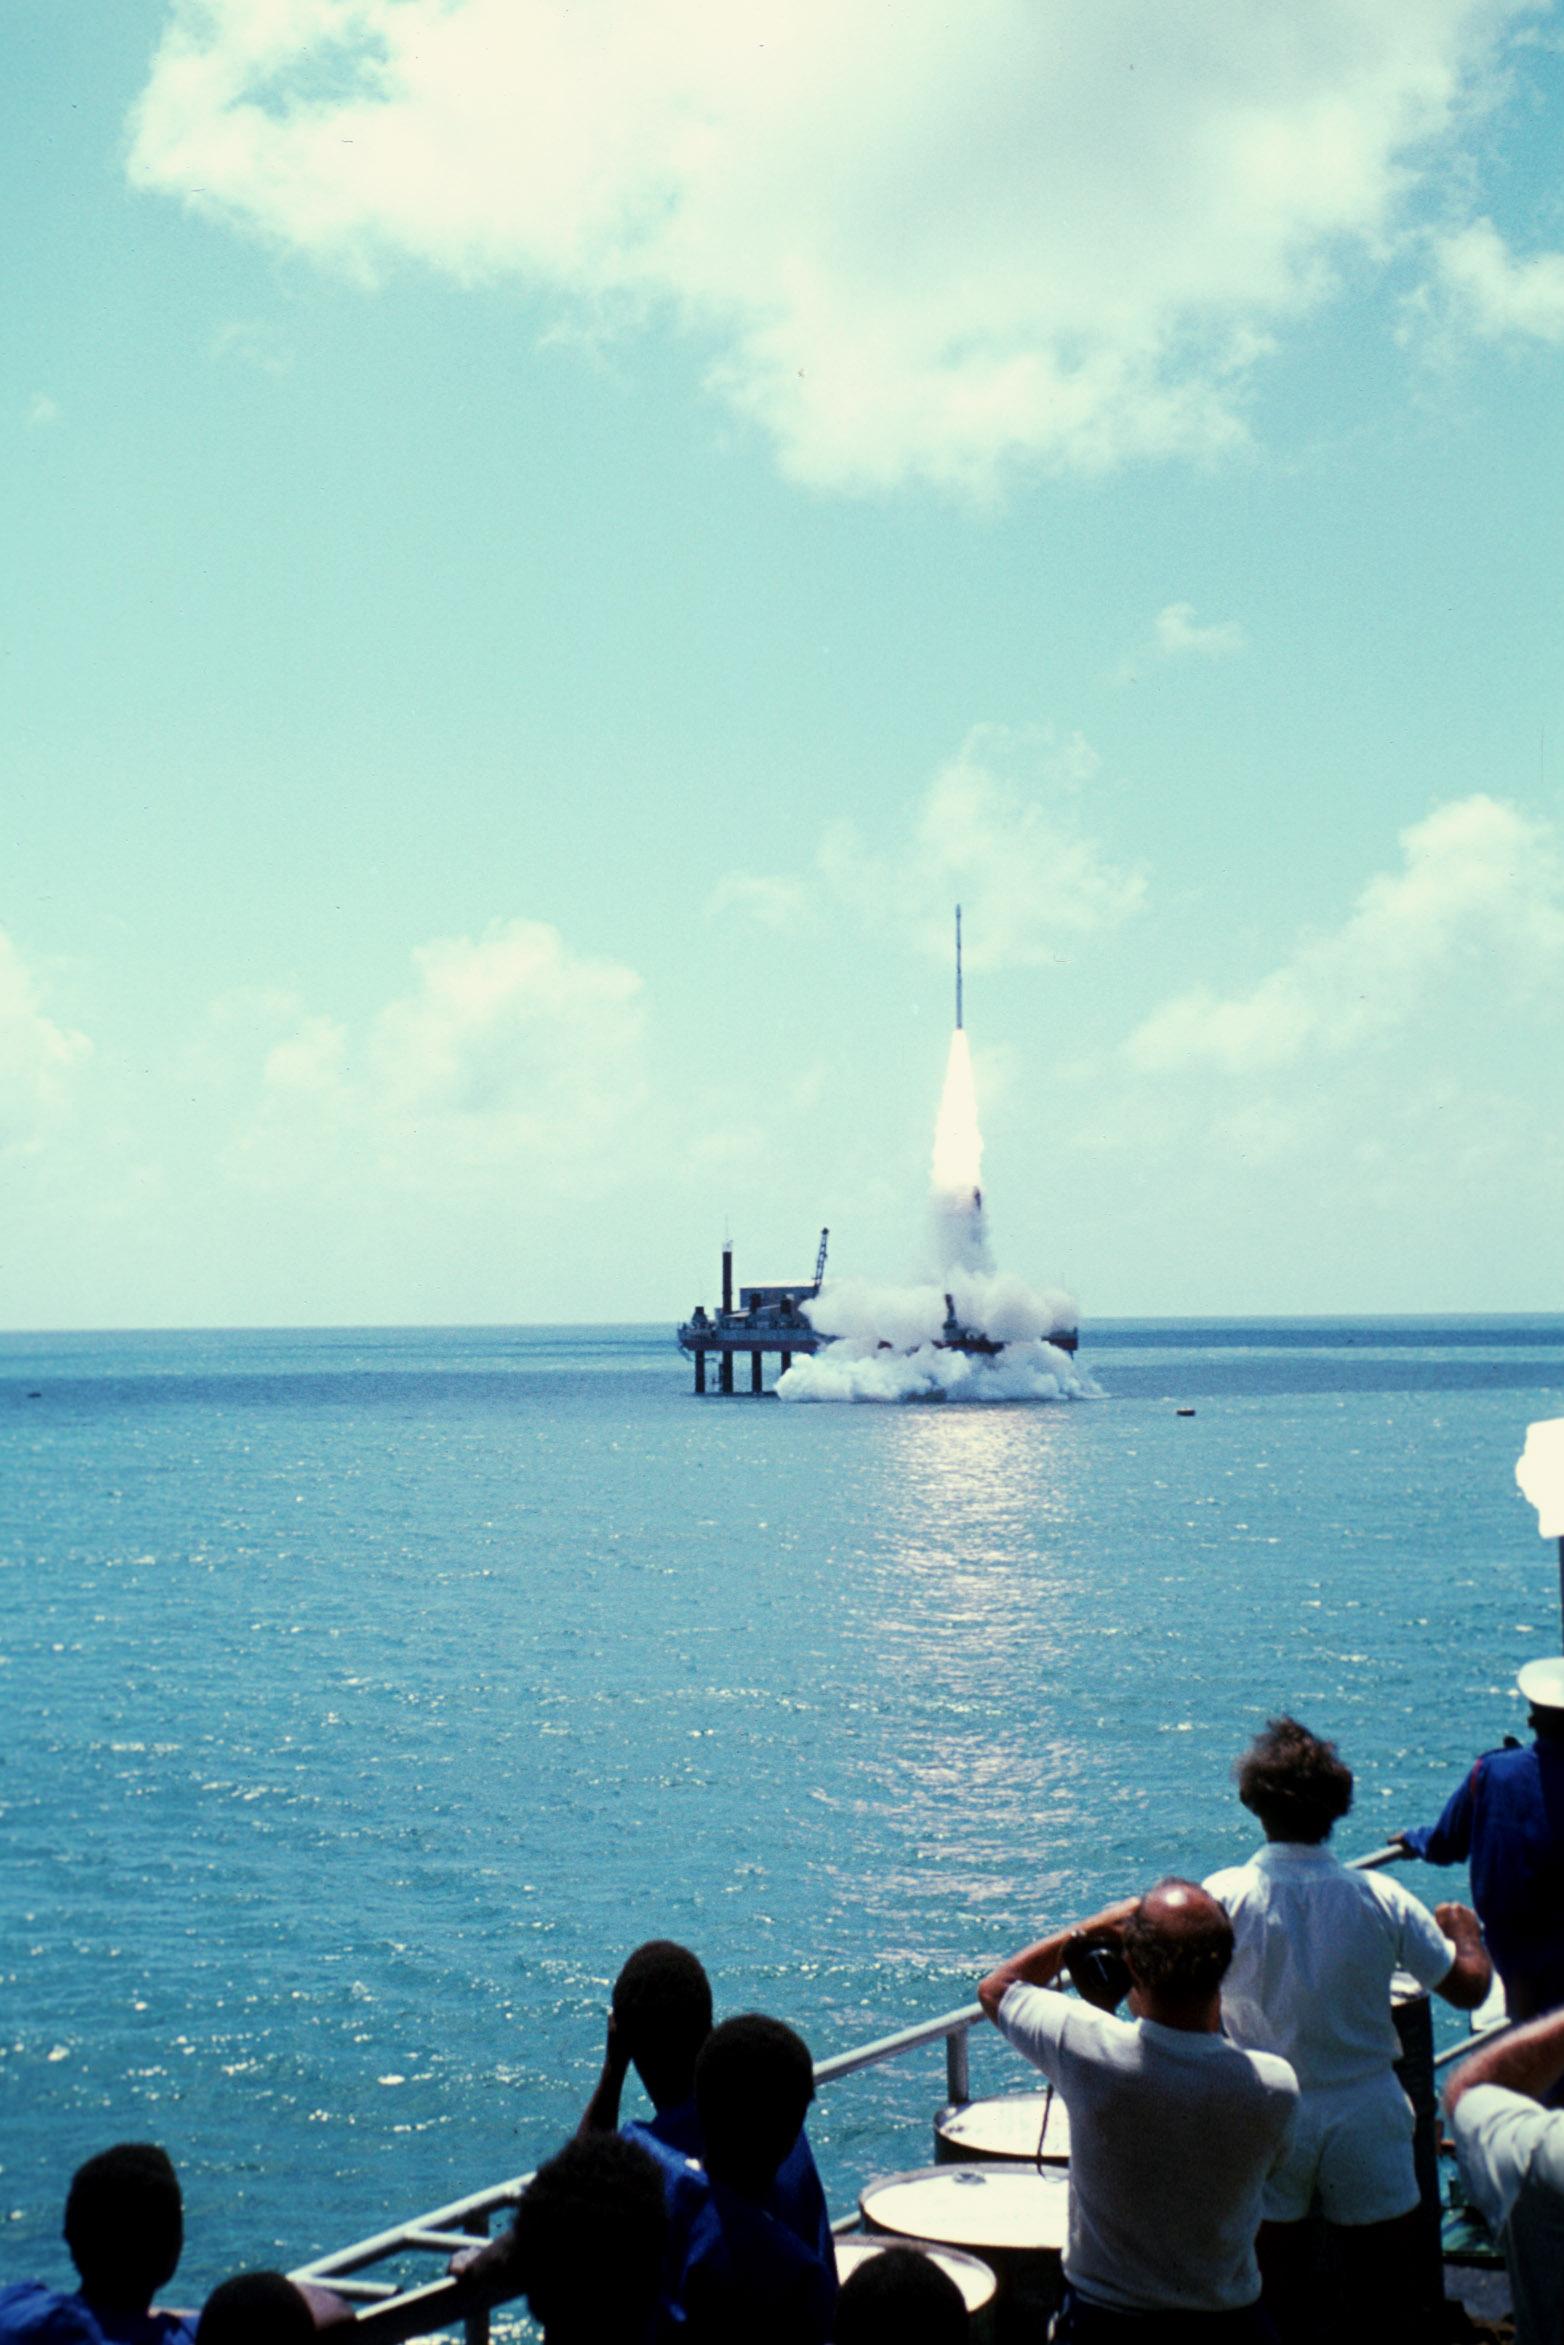 File:Lancio Ariel 5.jpg - Wikimedia Commons